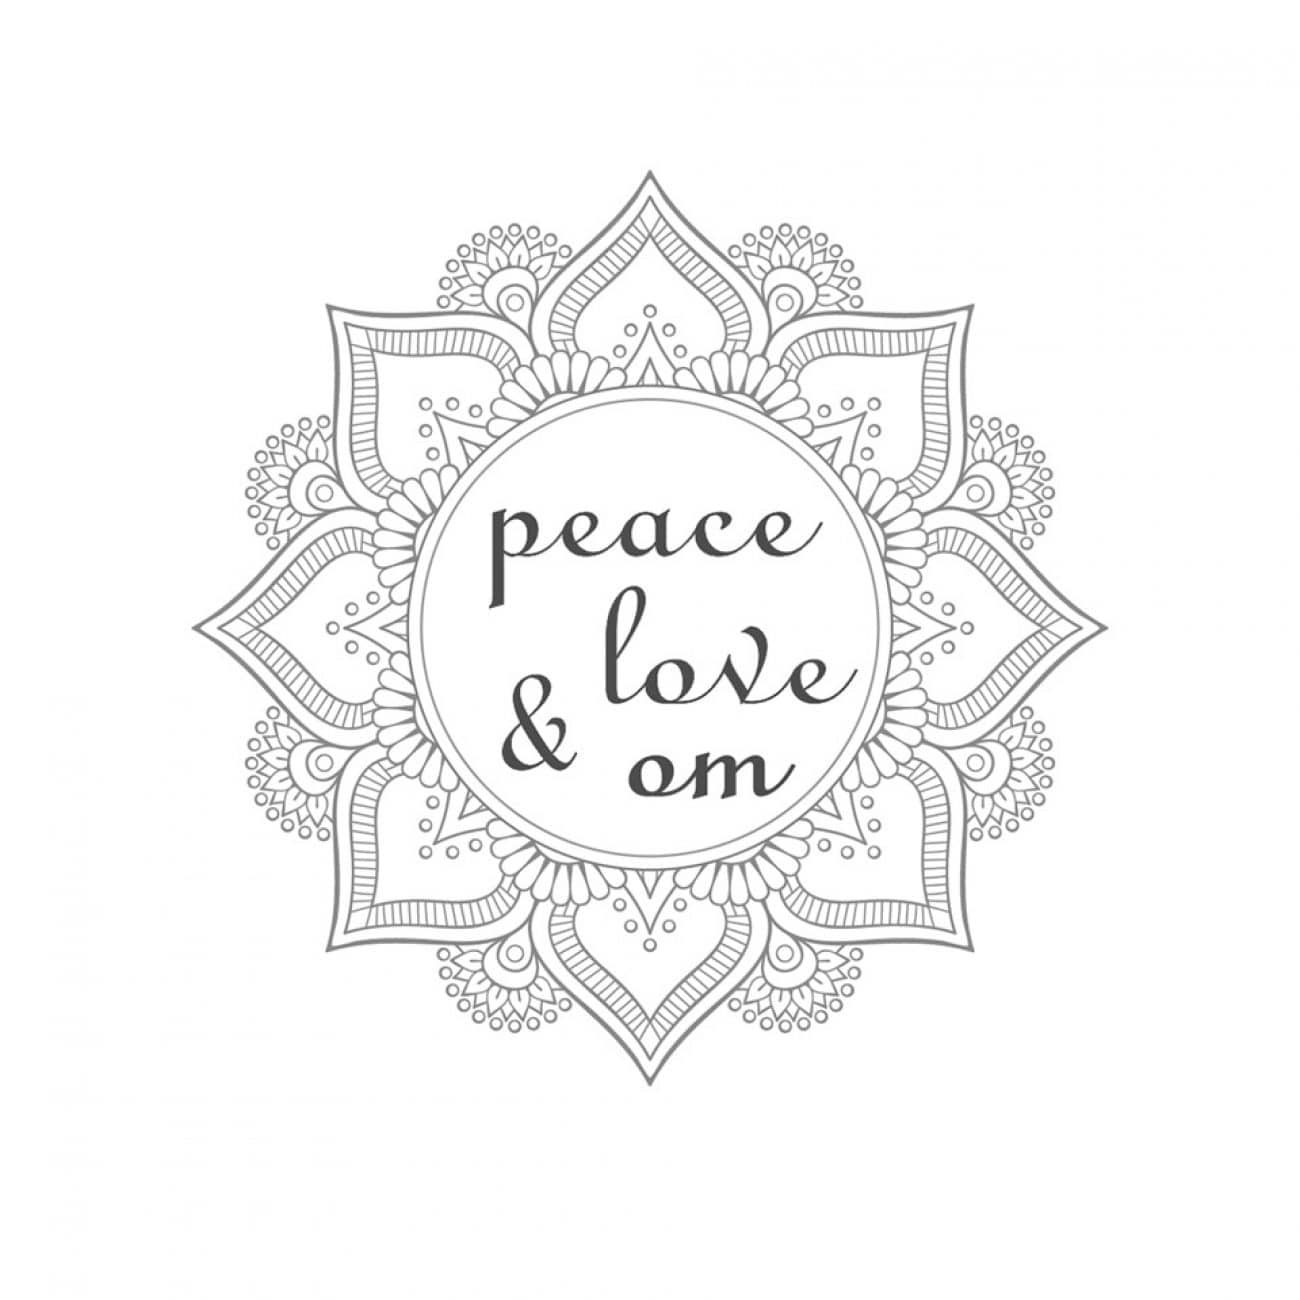 logo_d_1-1-nr6yfzlmtlwt17hl8i0jf5qr2fuj6pg42nq0hwpfpk